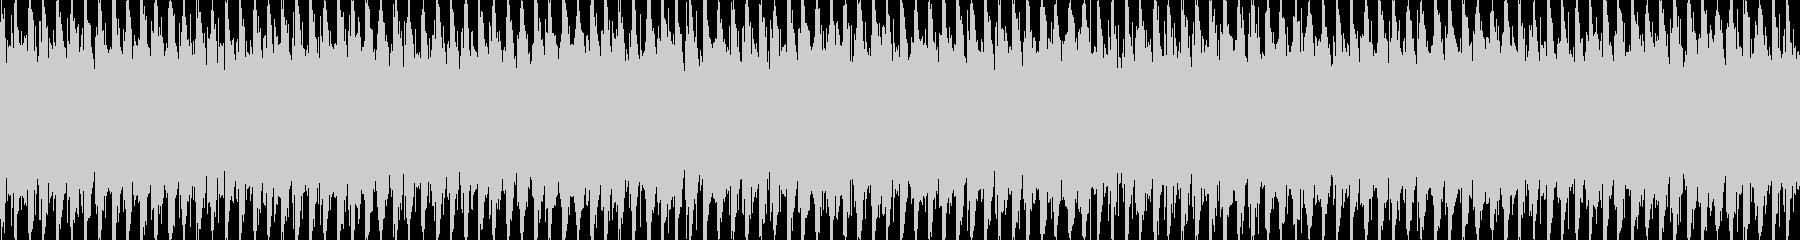 Ambient Technoの未再生の波形